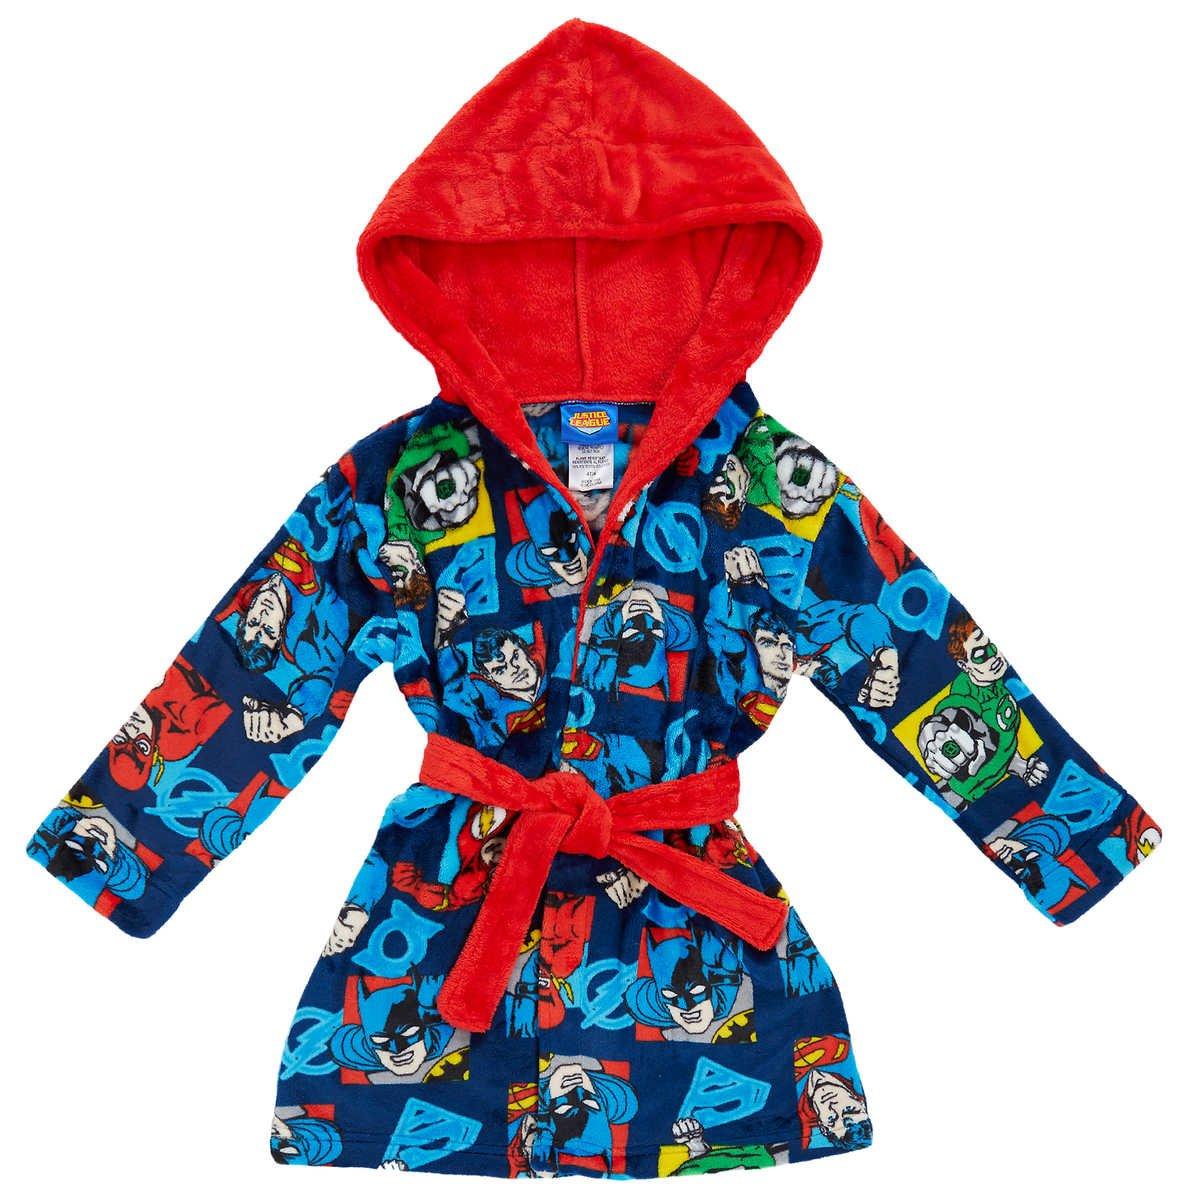 Superhero Toddler Boys' Velvet Fleece Hooded Robe Pajama 6 Justice League